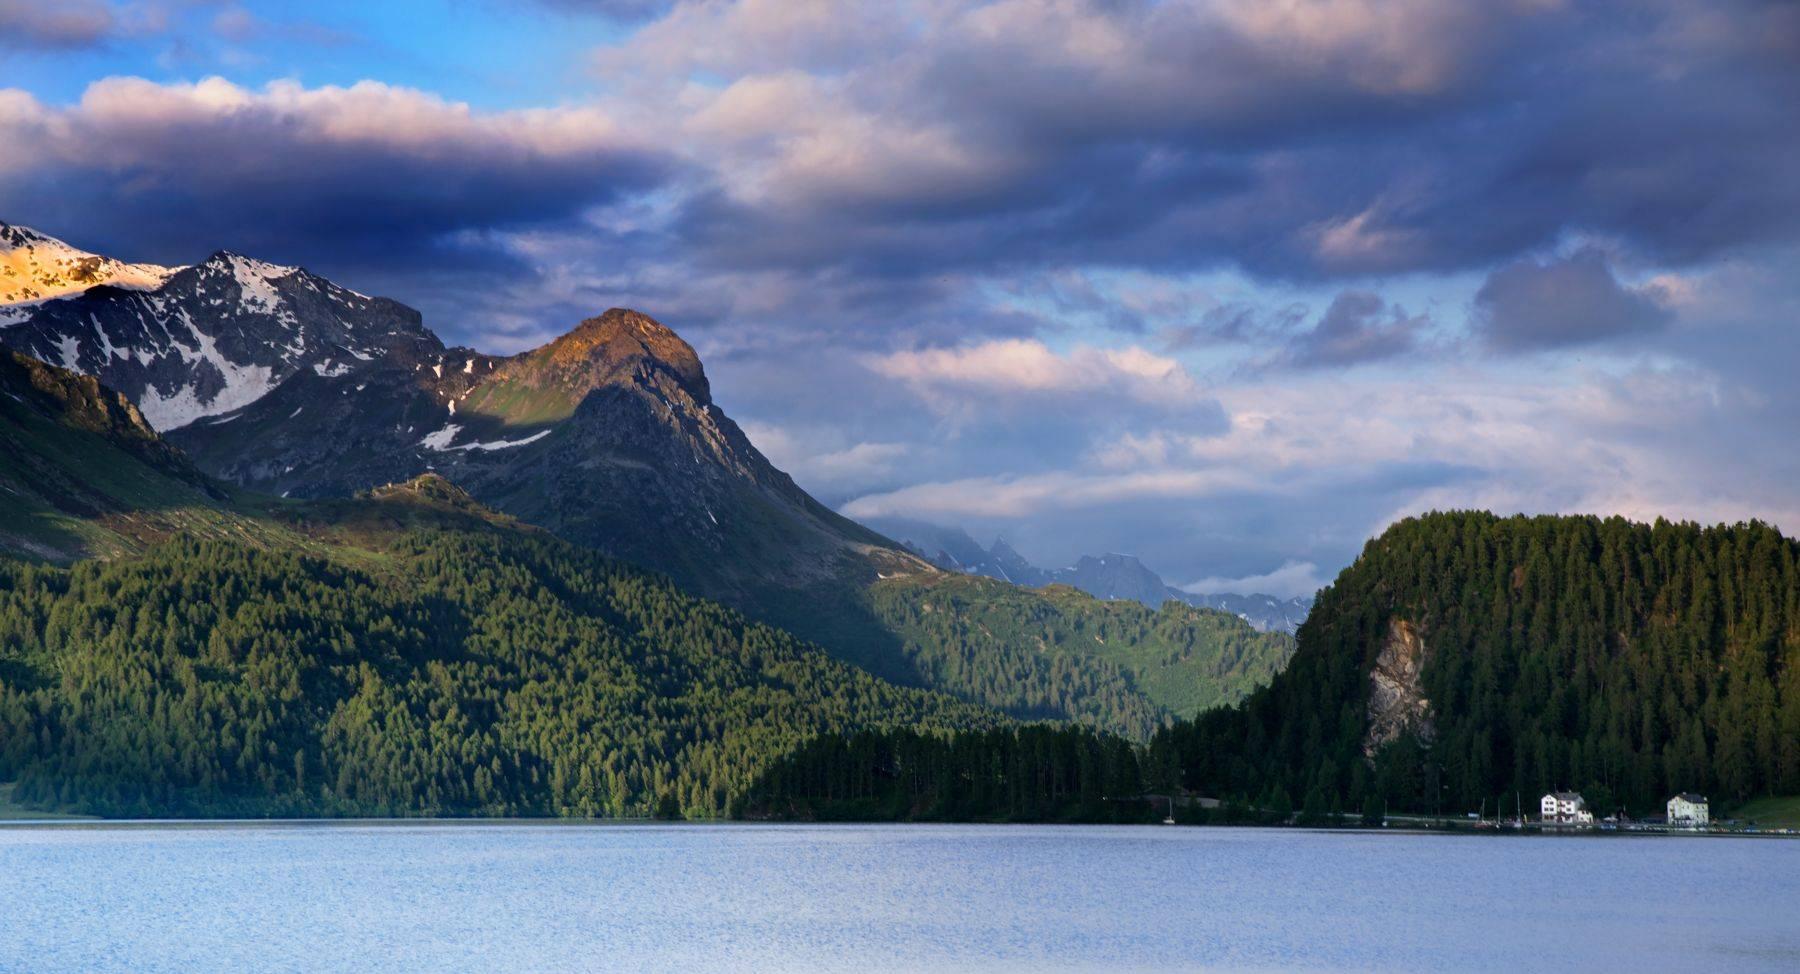 Lake St. Moritz, Switzerland